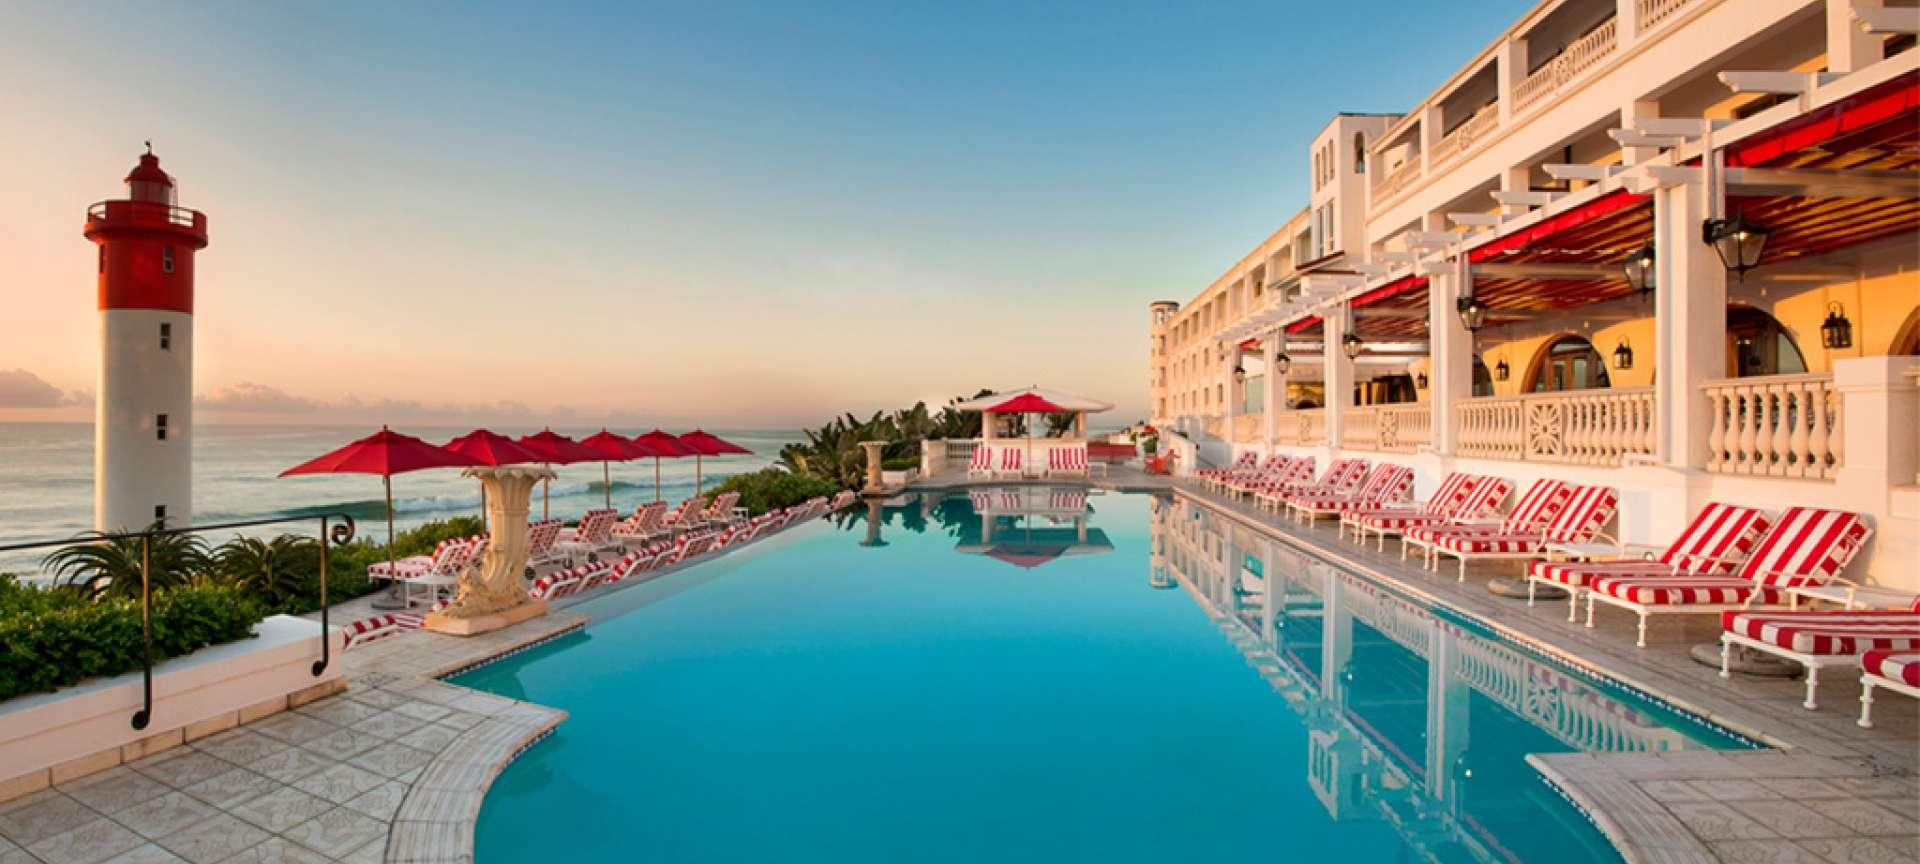 Durban-Hotels